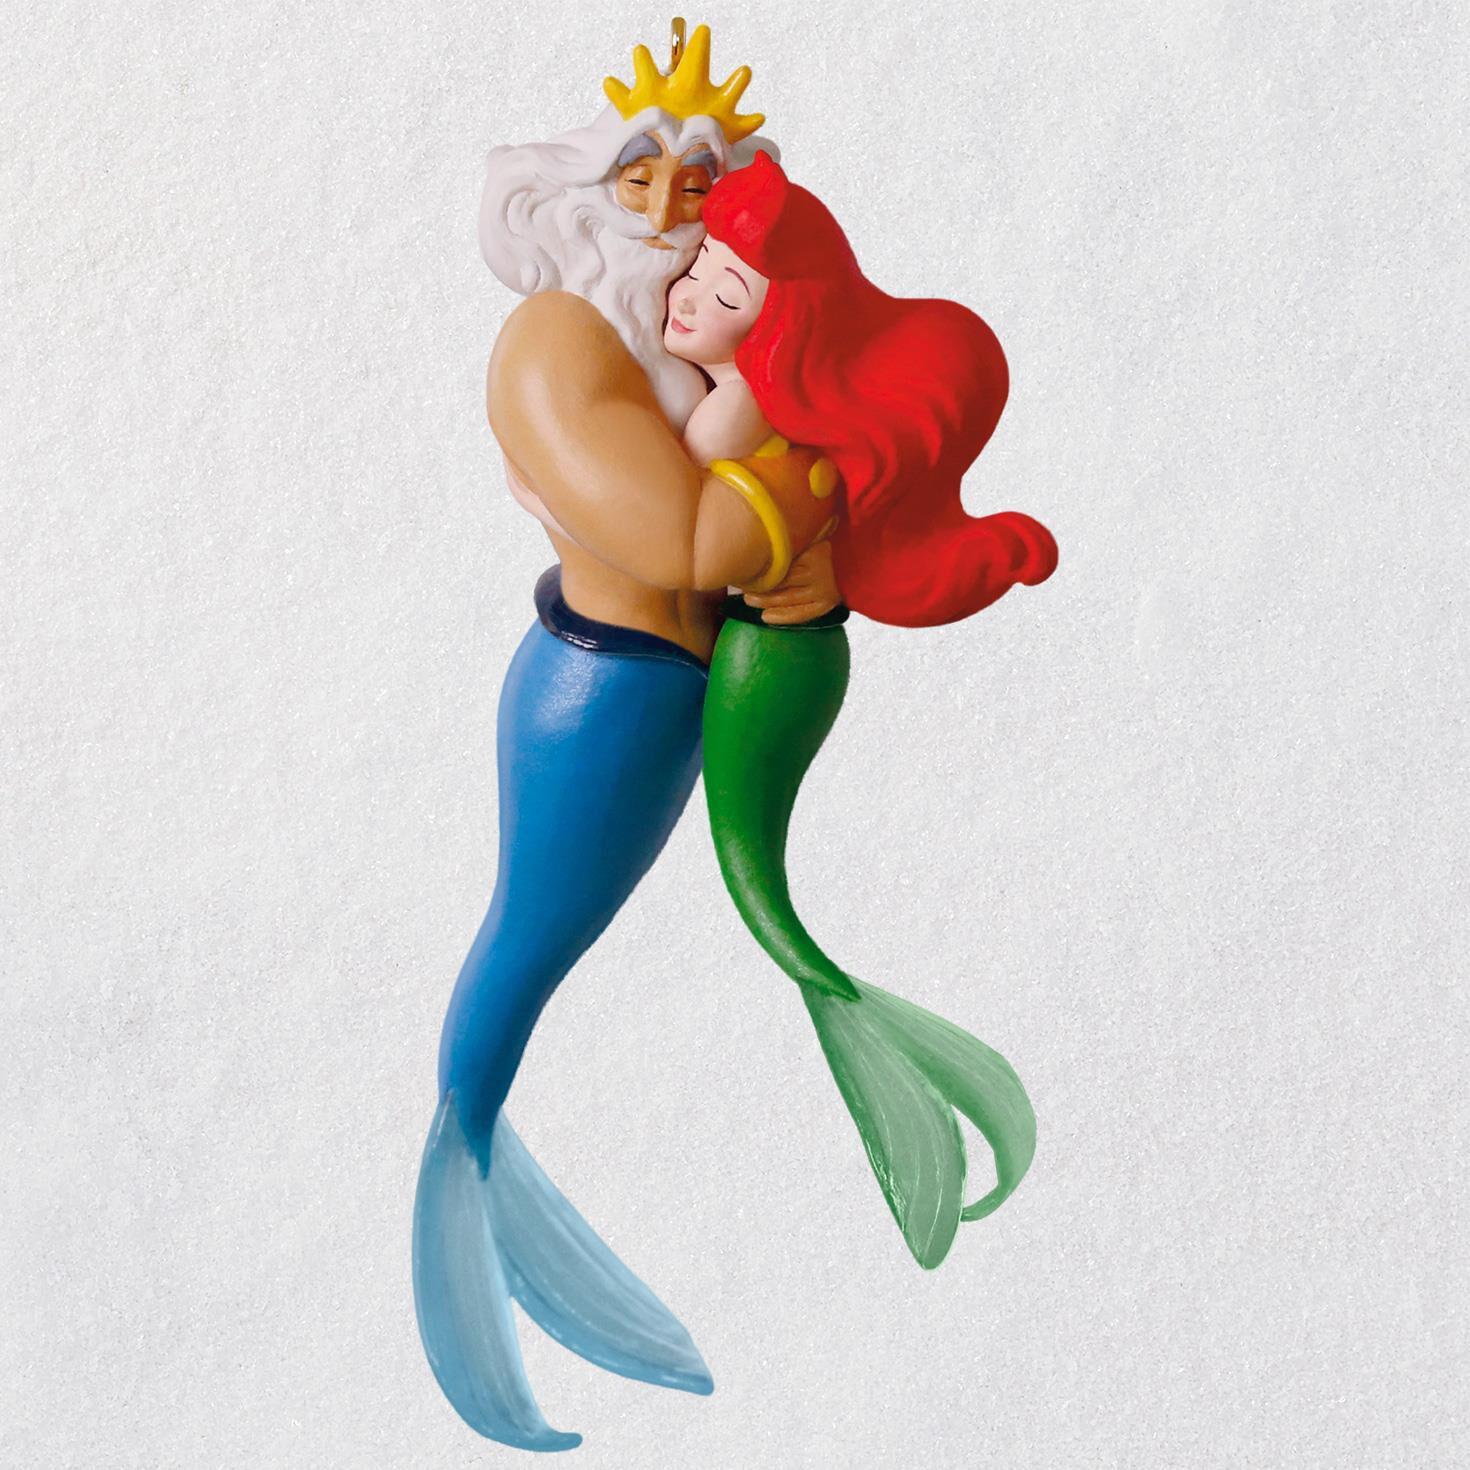 disney the little mermaid ariel and king triton ornament keepsake